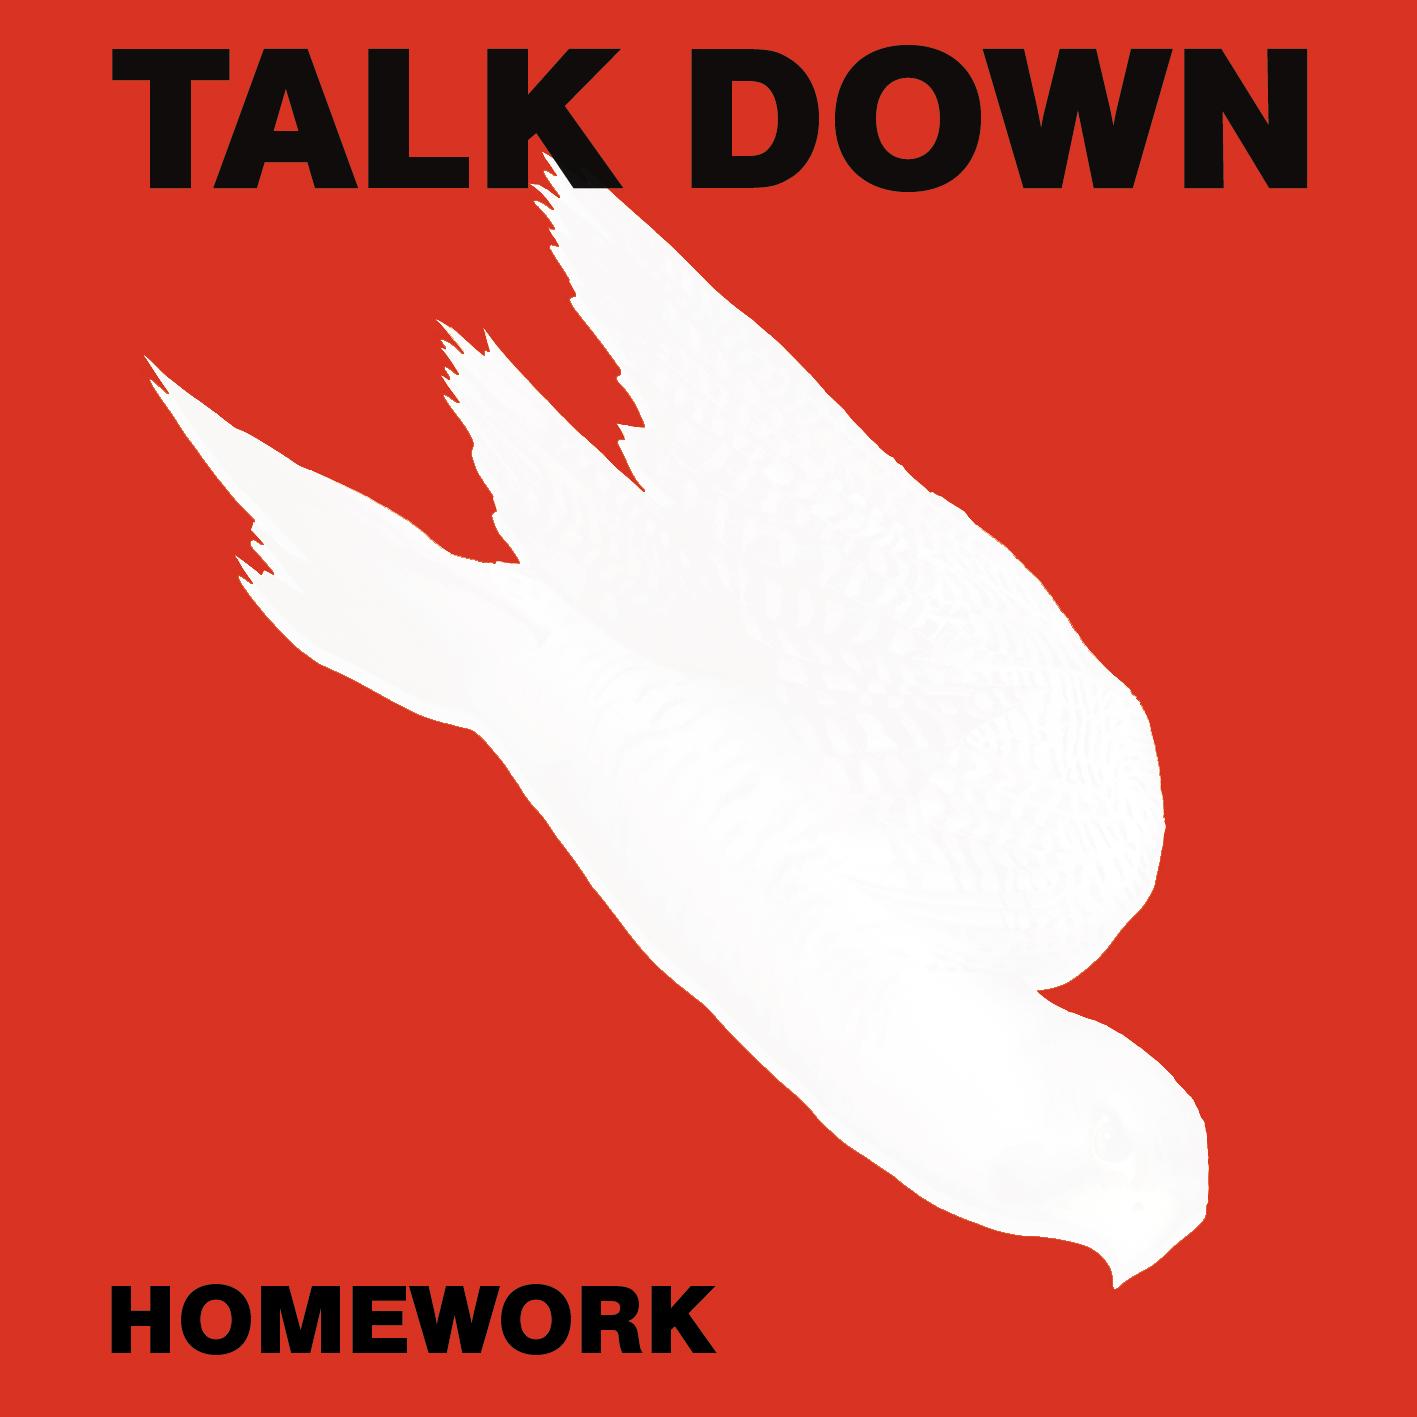 Homework - Talk Down